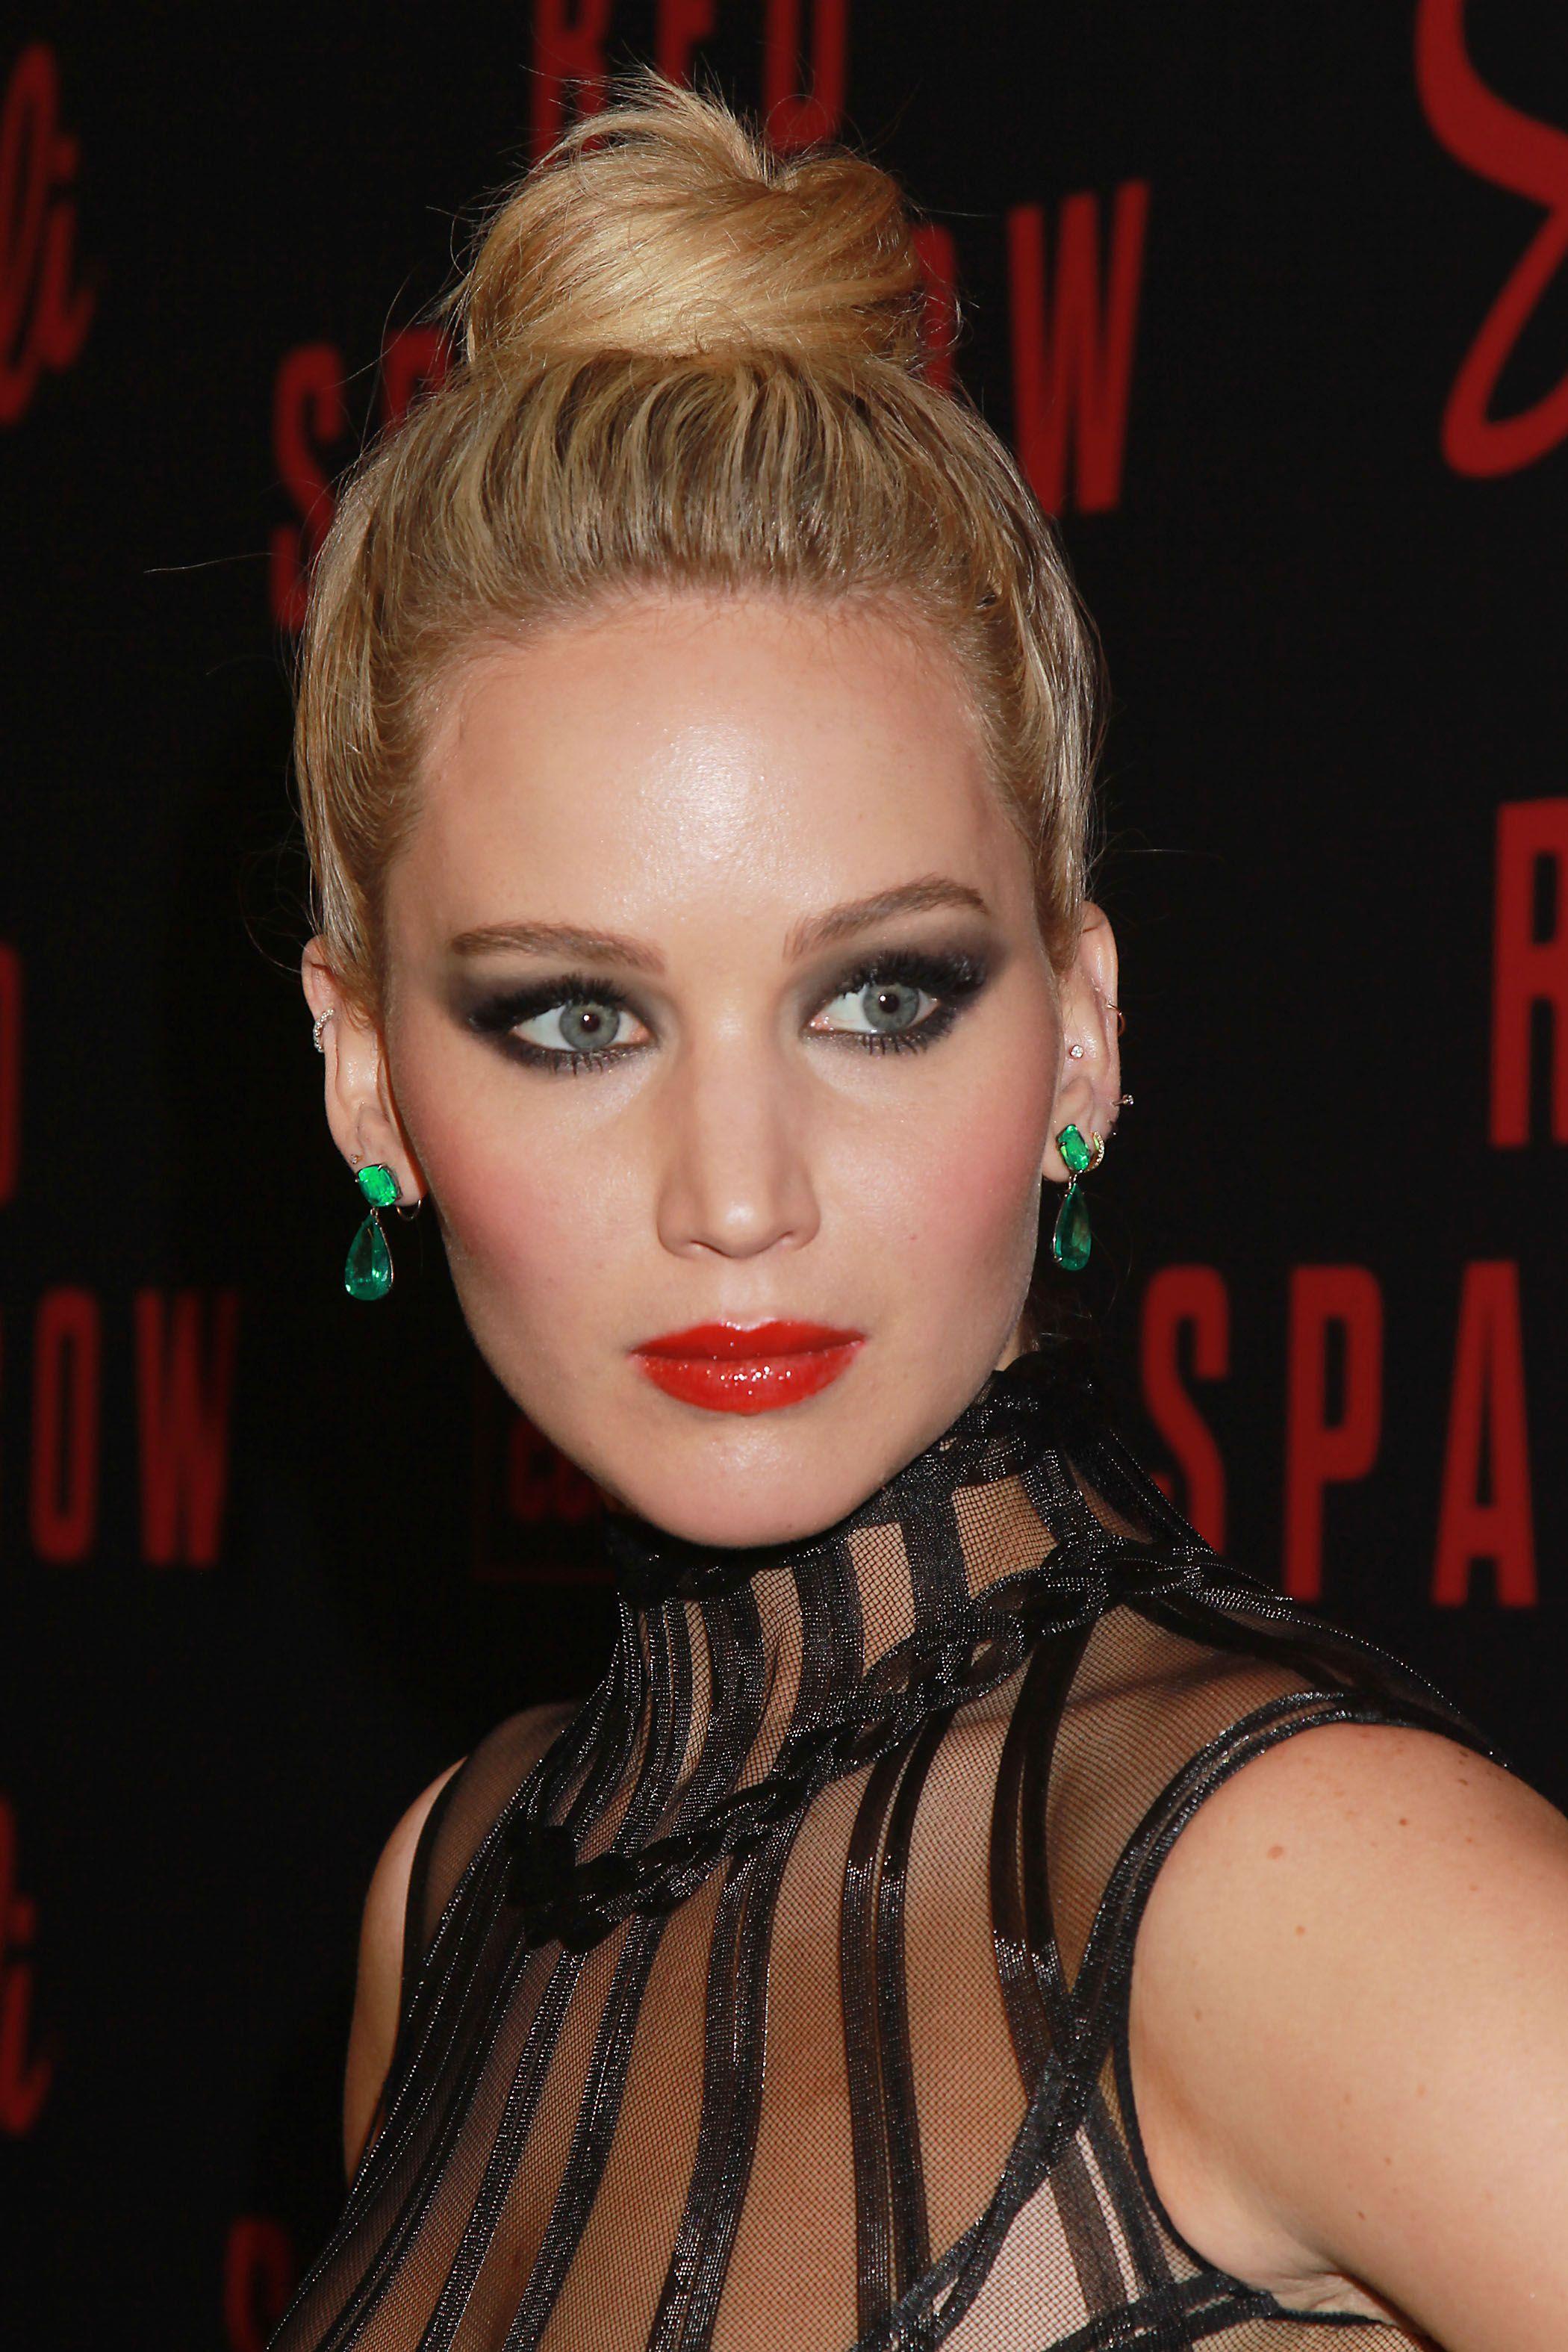 Jennifer Lawrence Proves Mascara Isn't aMust Jennifer Lawrence Proves Mascara Isn't aMust new images